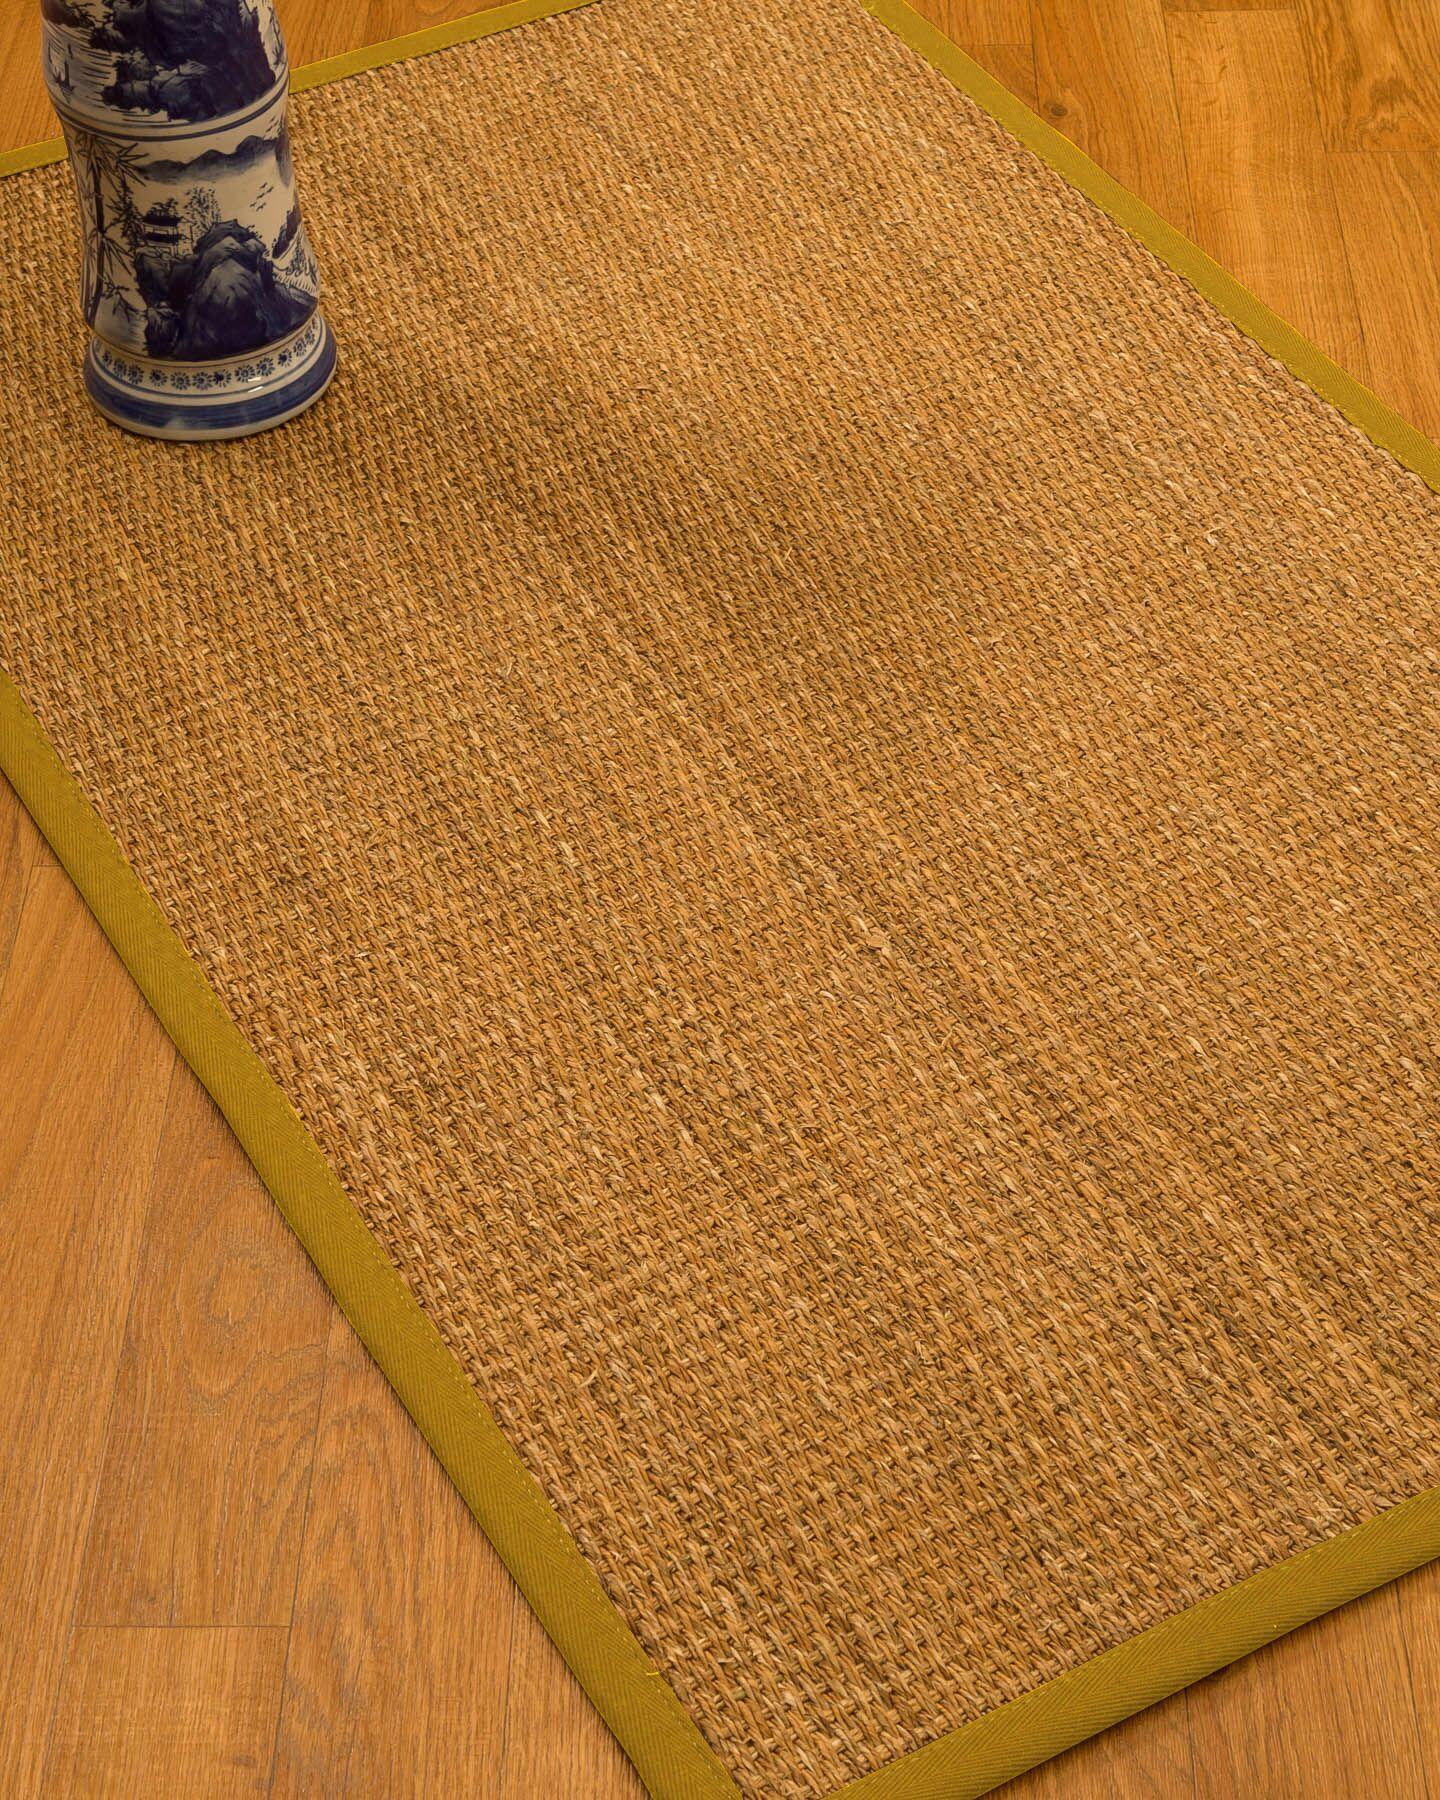 Kimberwood Border Hand-Woven Brown/Tan Area Rug Rug Size: Rectangle 5' x 8', Rug Pad Included: Yes